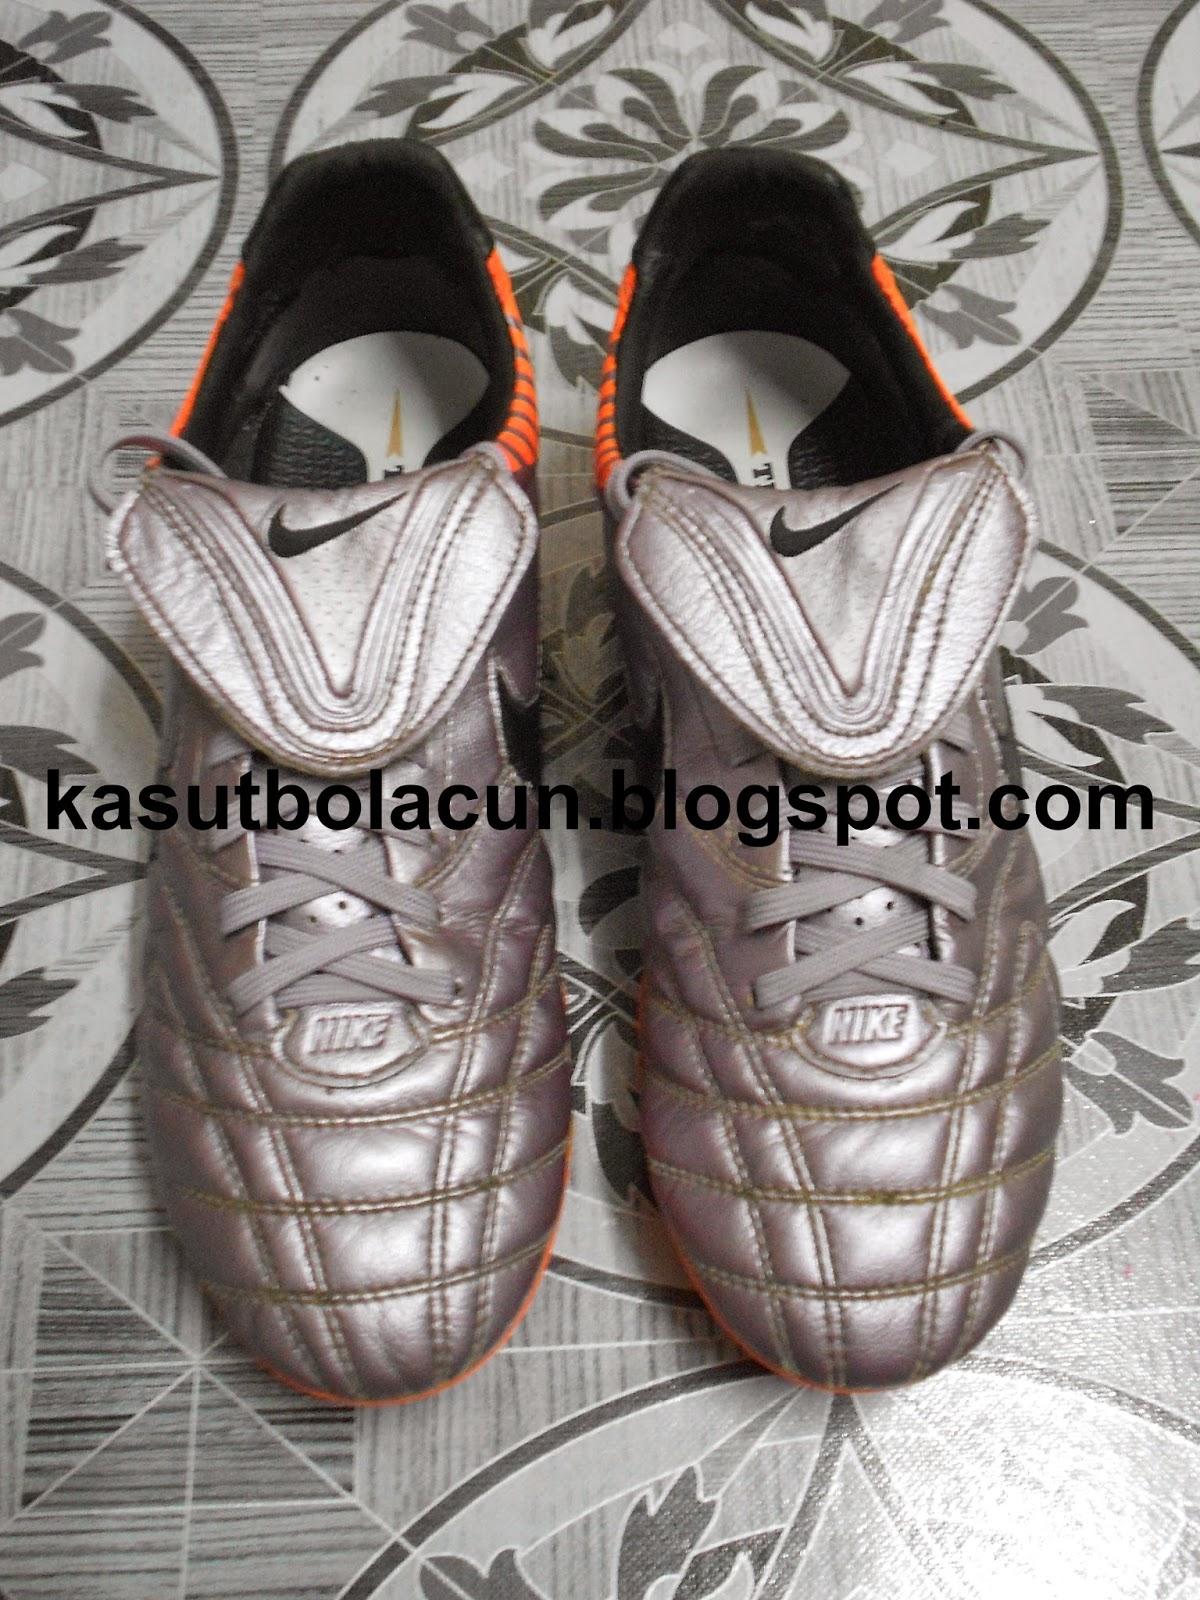 http://kasutbolacun.blogspot.com/2015/02/nike-tiempo-legend-3-fg-elite-series.html